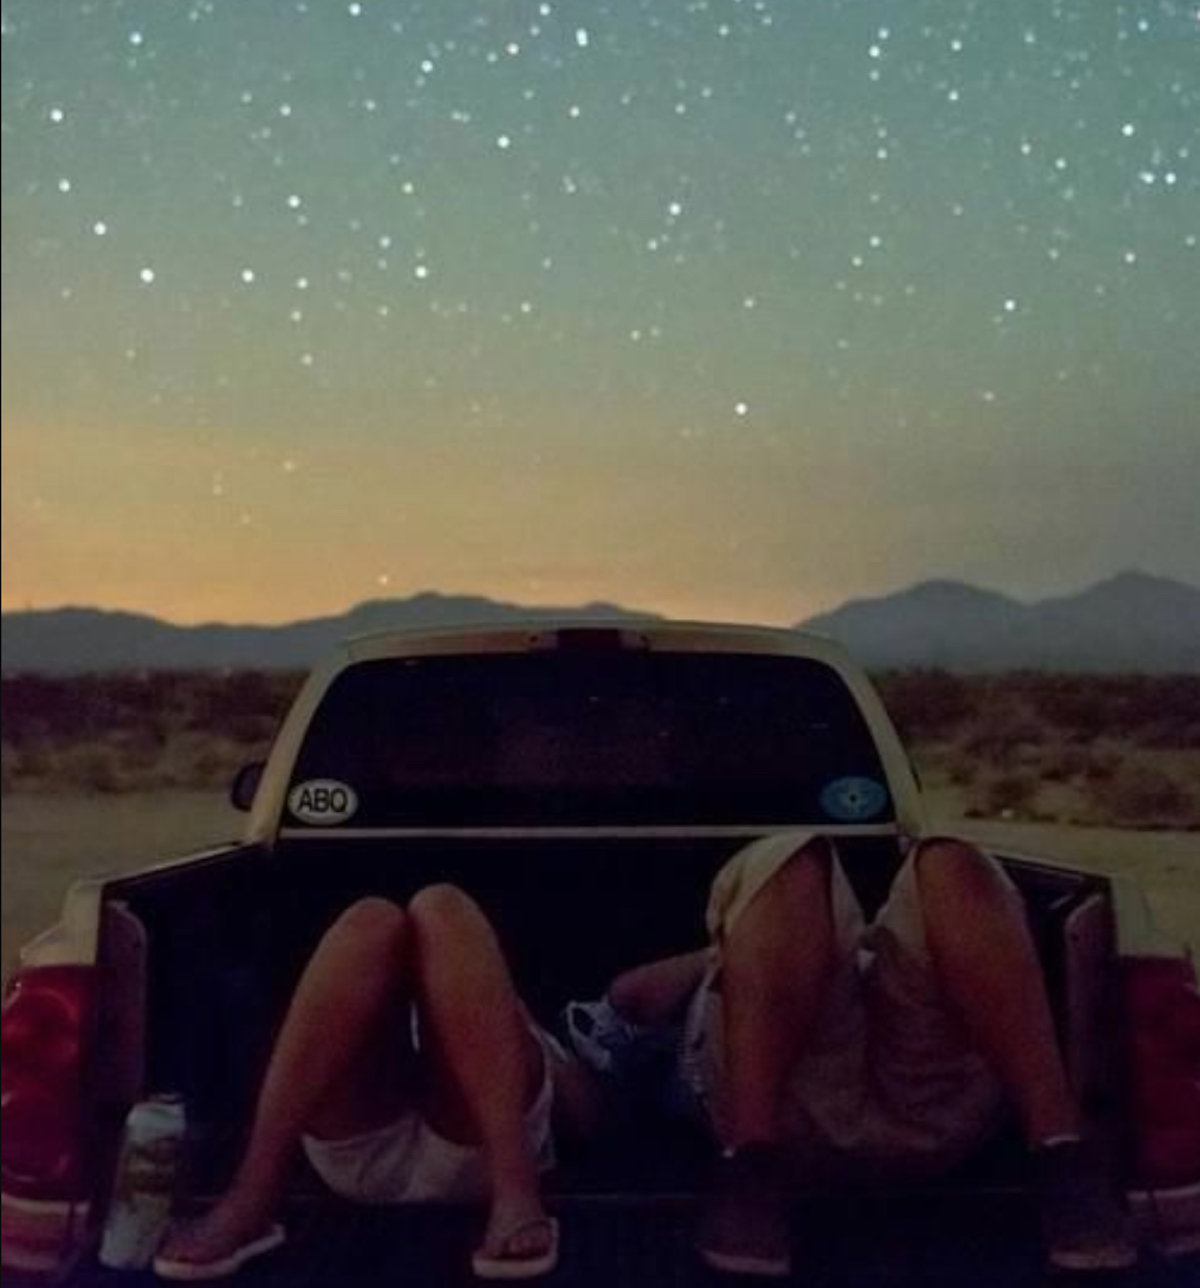 Stargazing car stock image